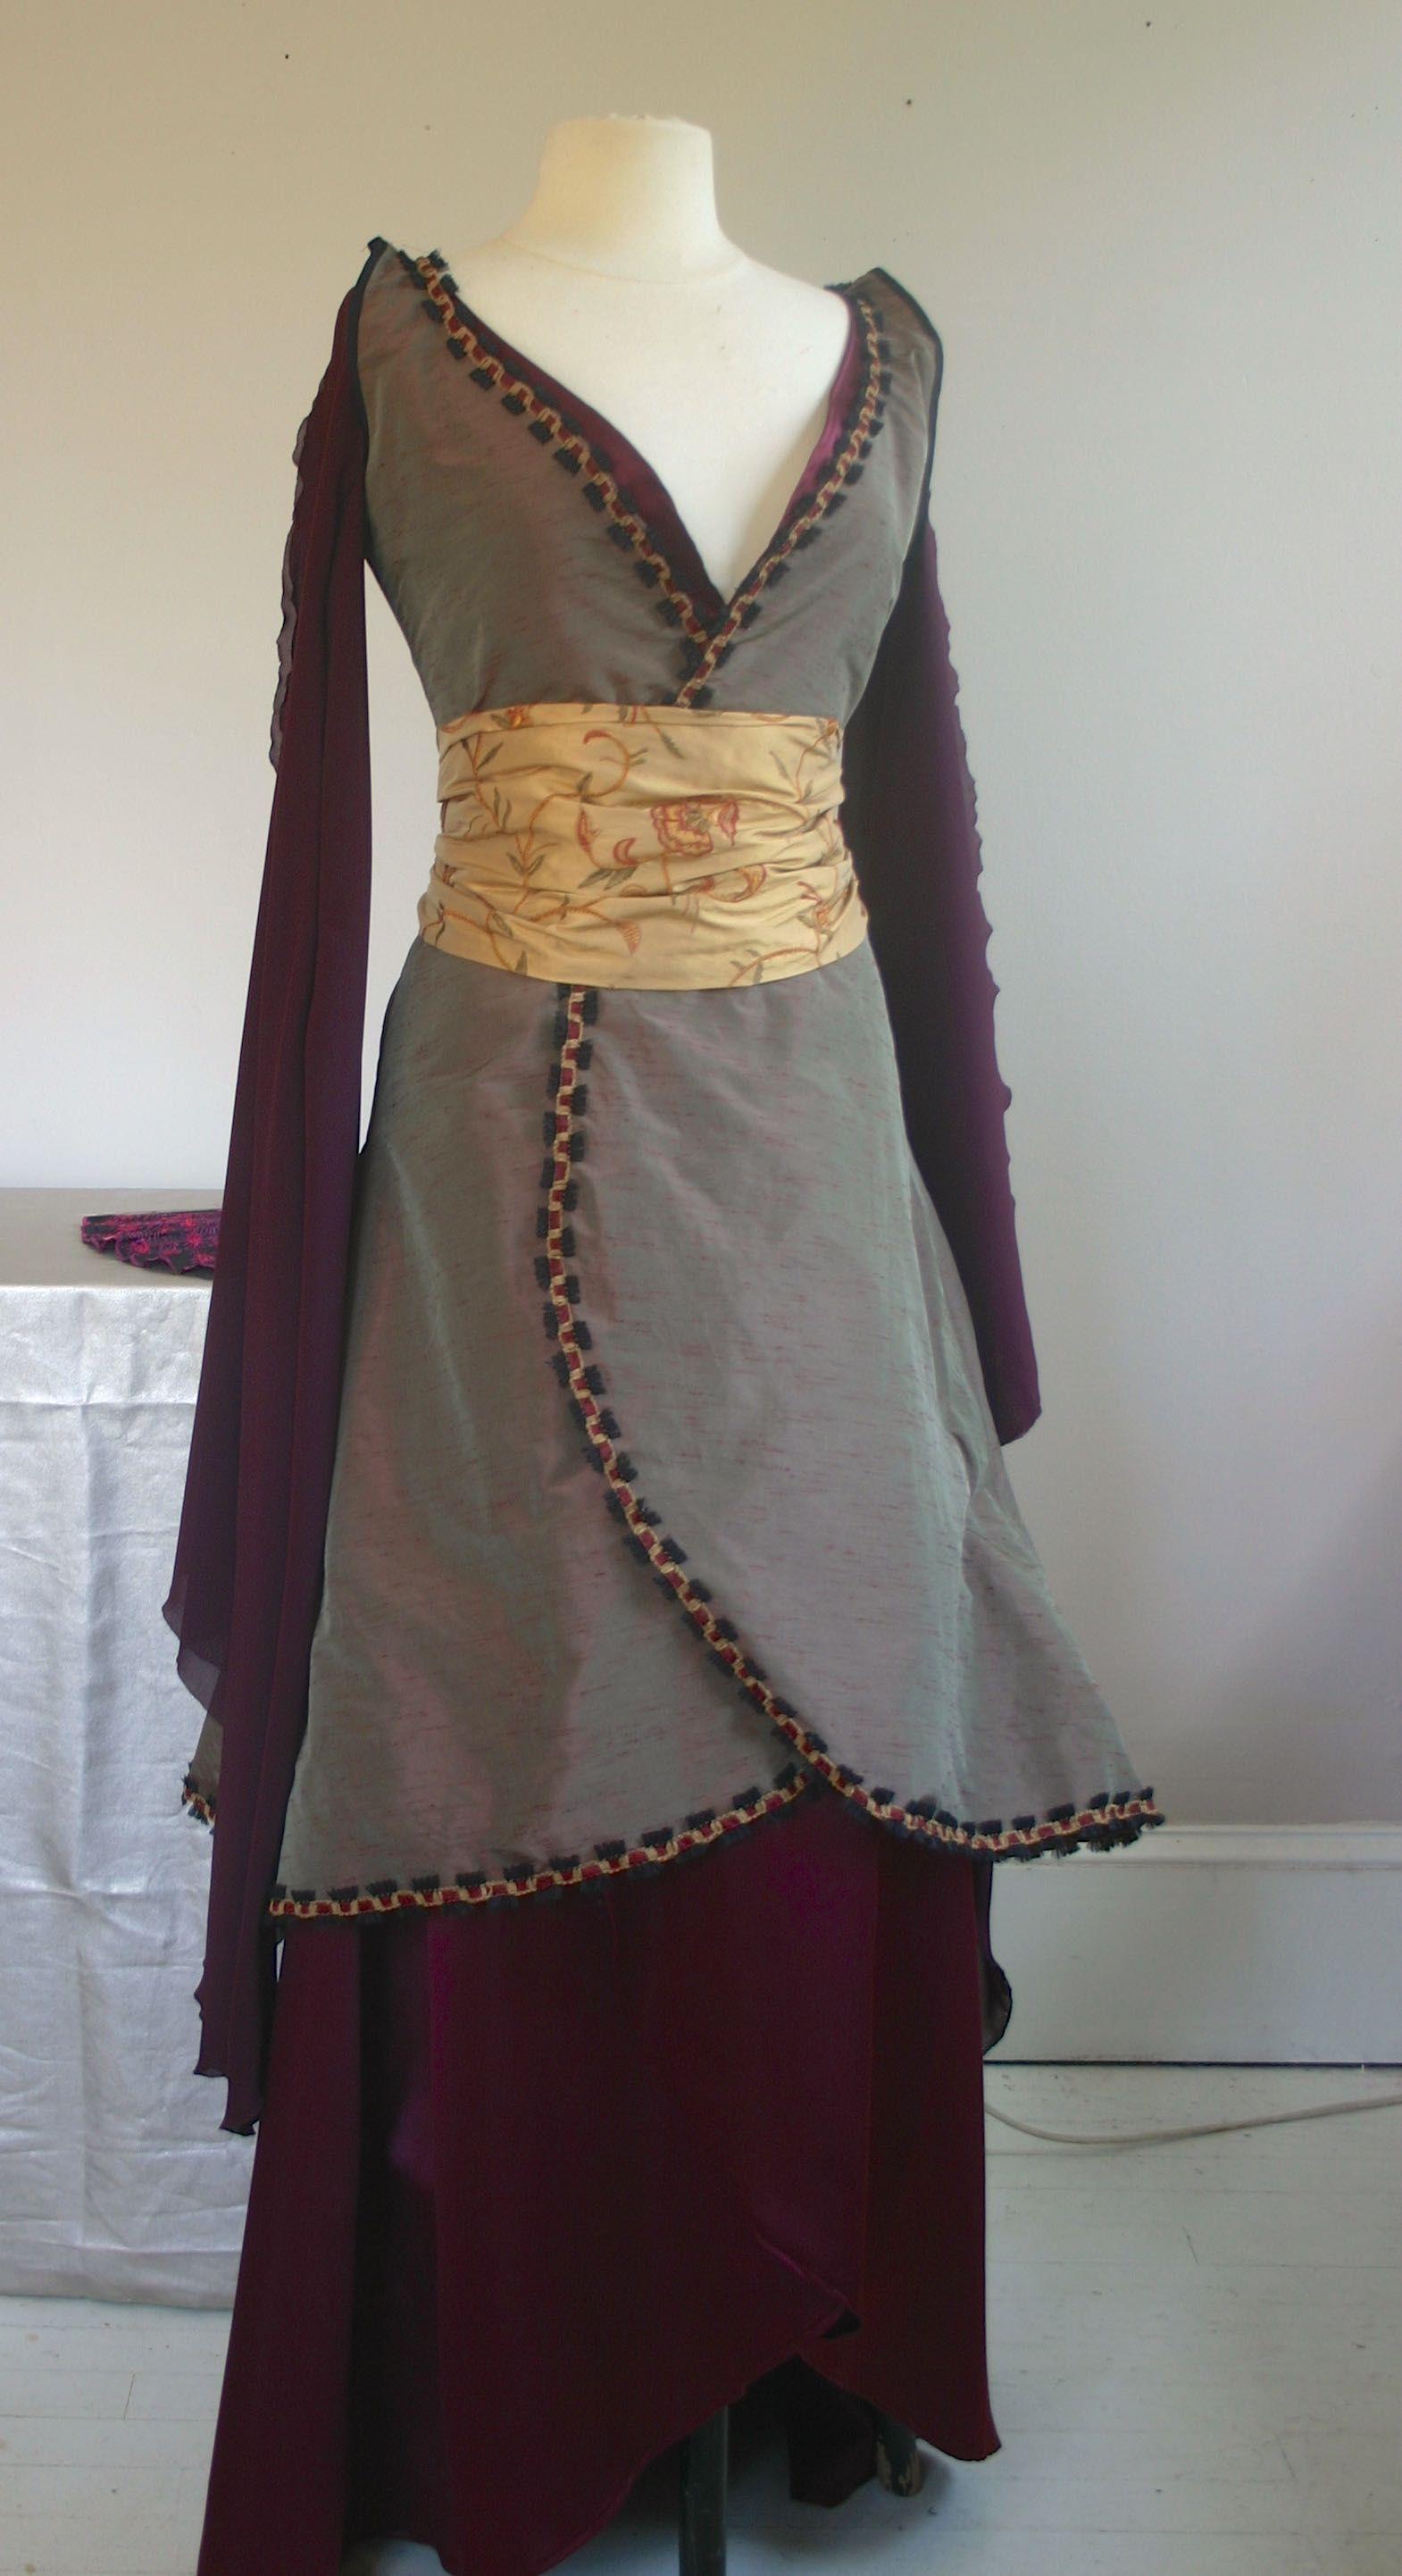 Inara's dress